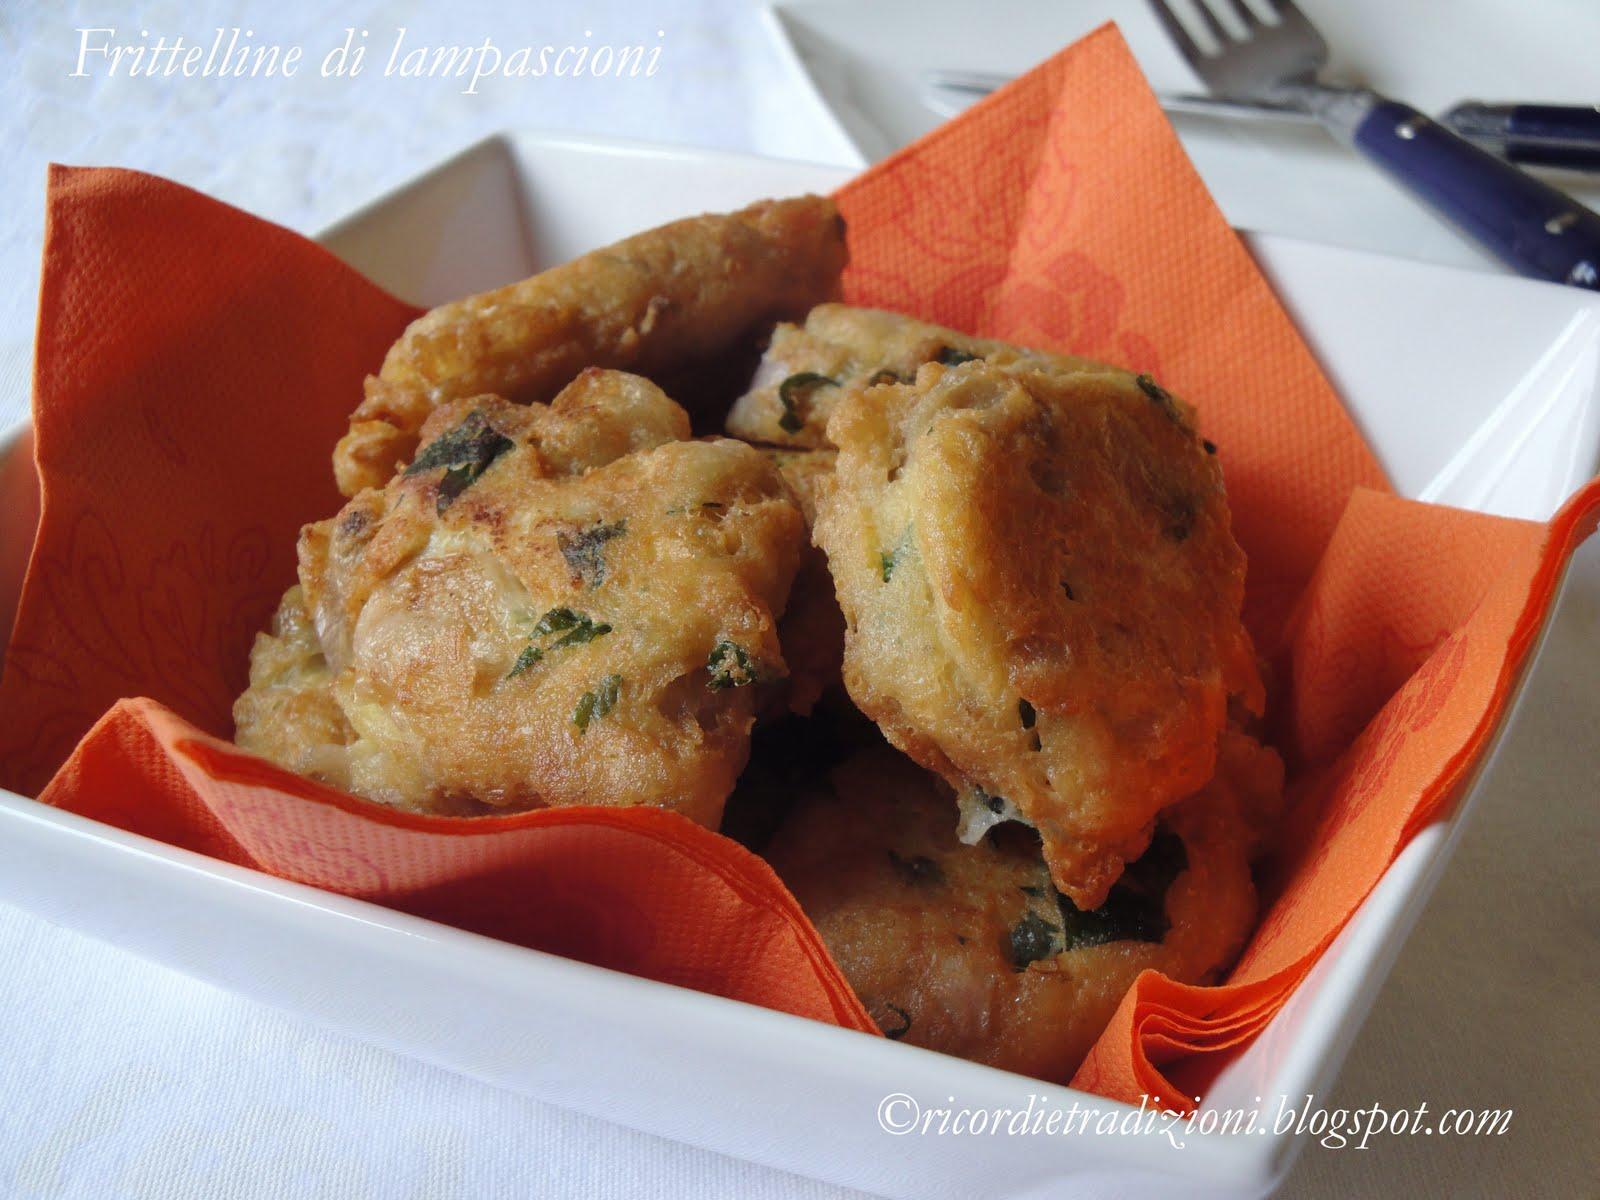 Ricetta Frittelle Di Muscari – Antipasto